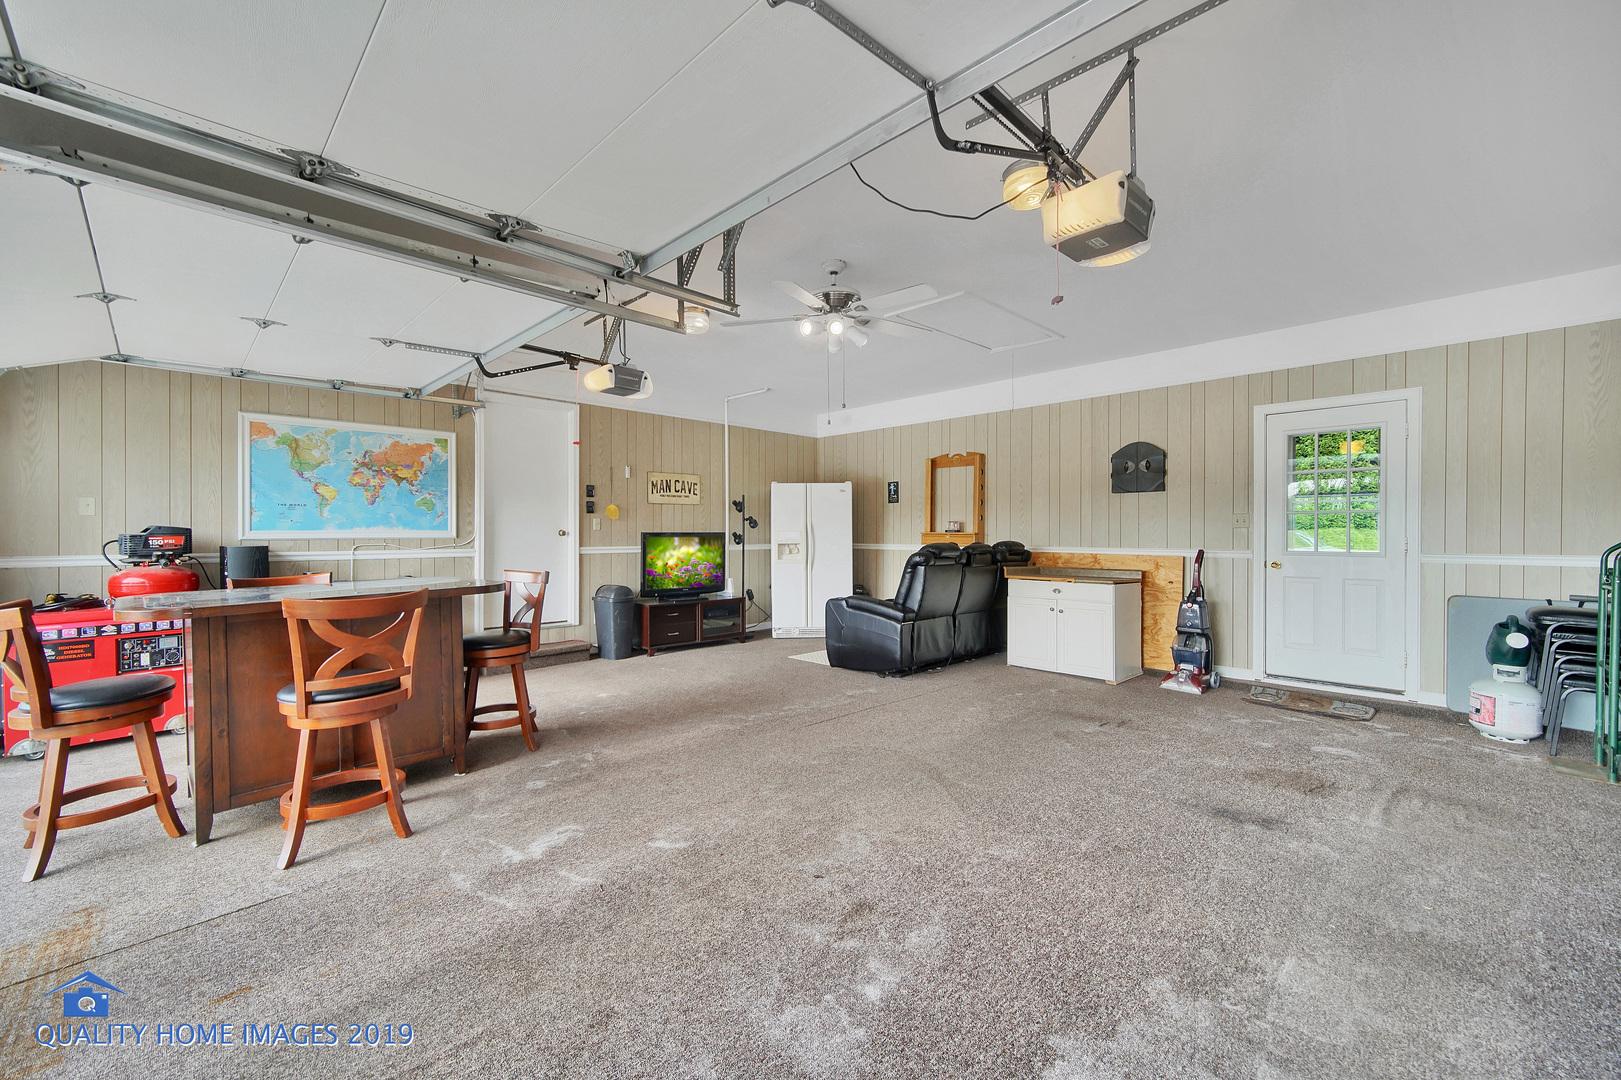 26711 South Greenbriar, Monee, Illinois, 60449